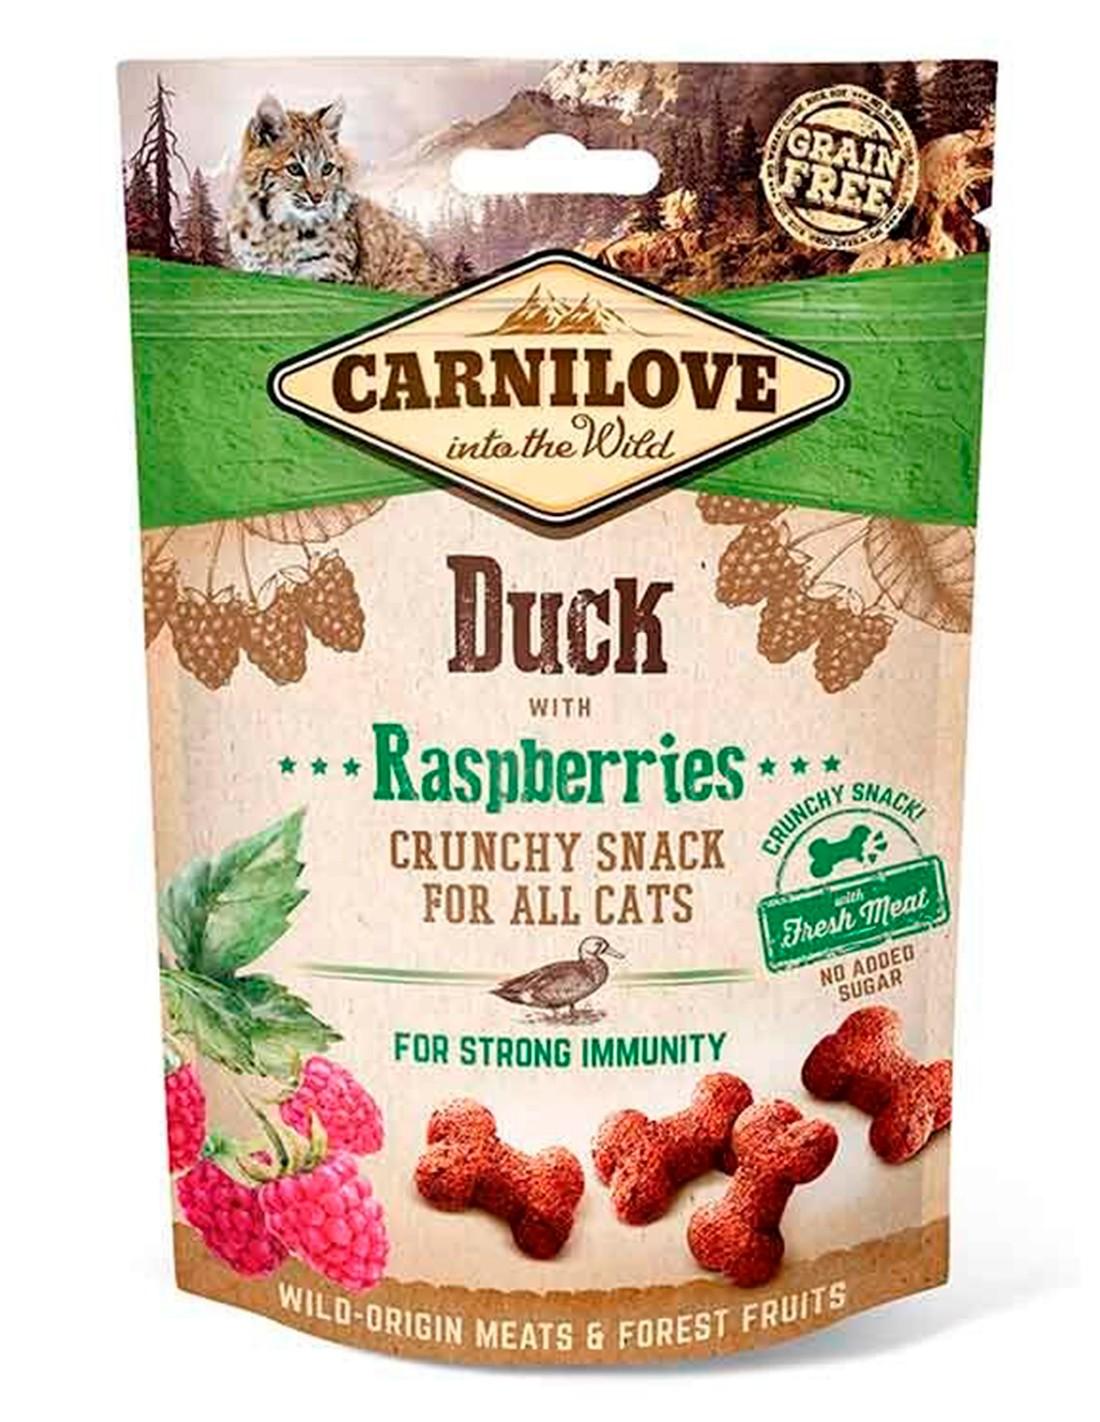 Carnilove Pato con frambuesas 50g - Snack Crunchy